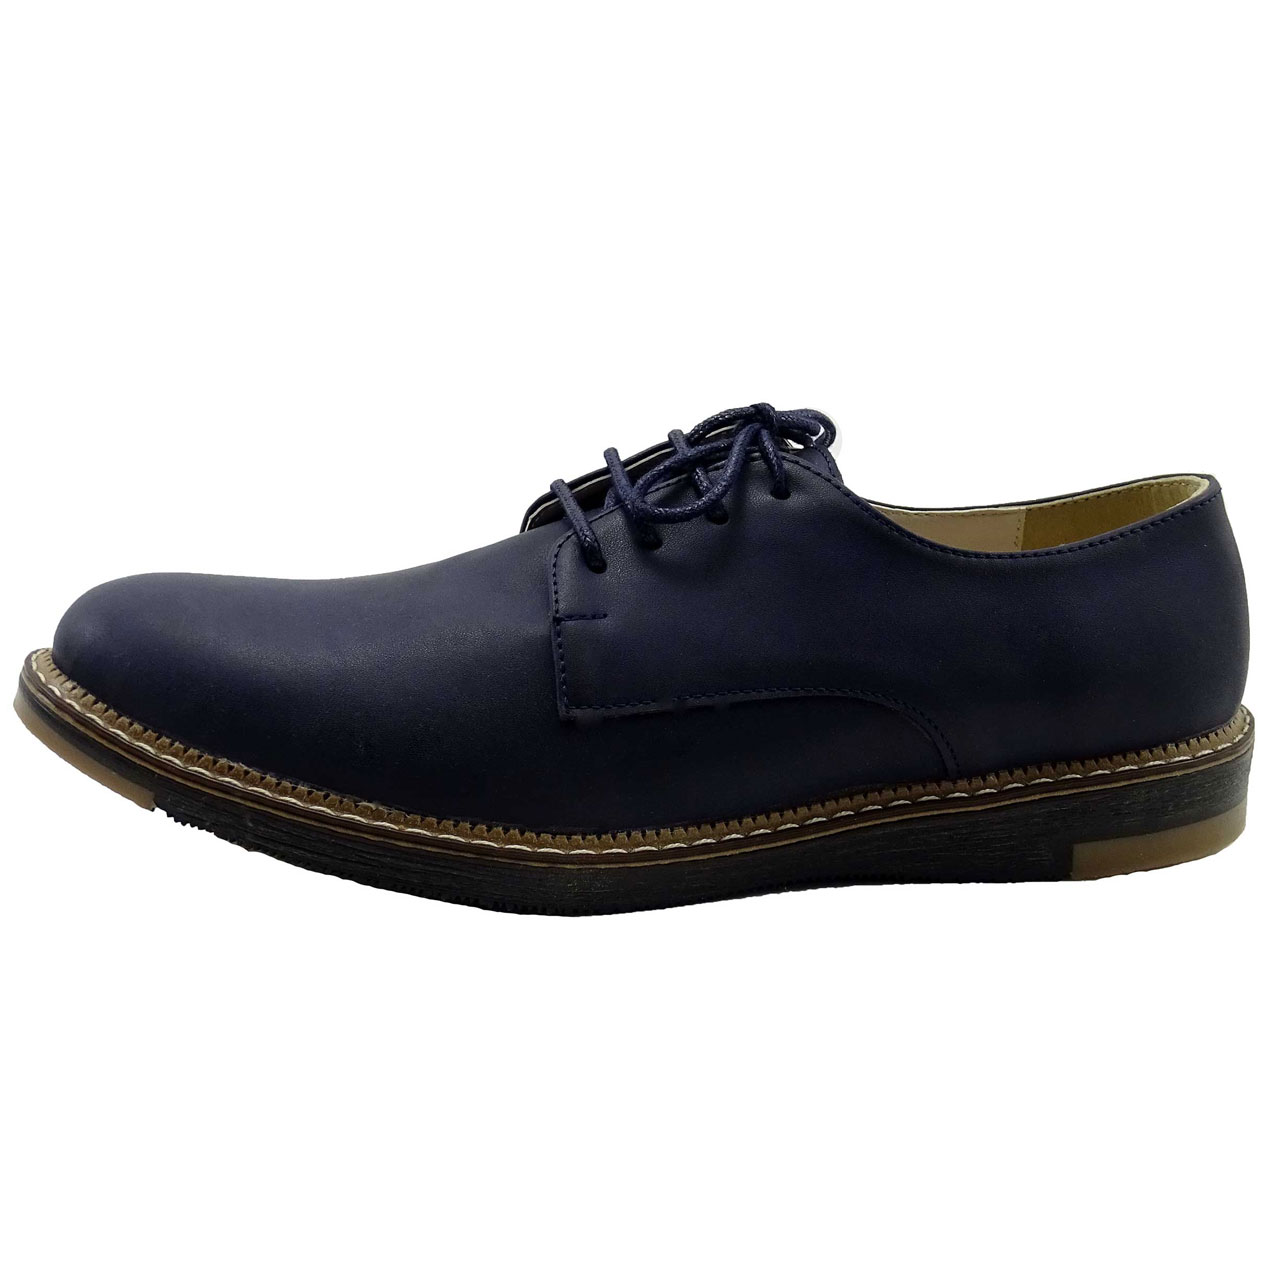 قیمت کفش مردانه آذاردو مدل M00612